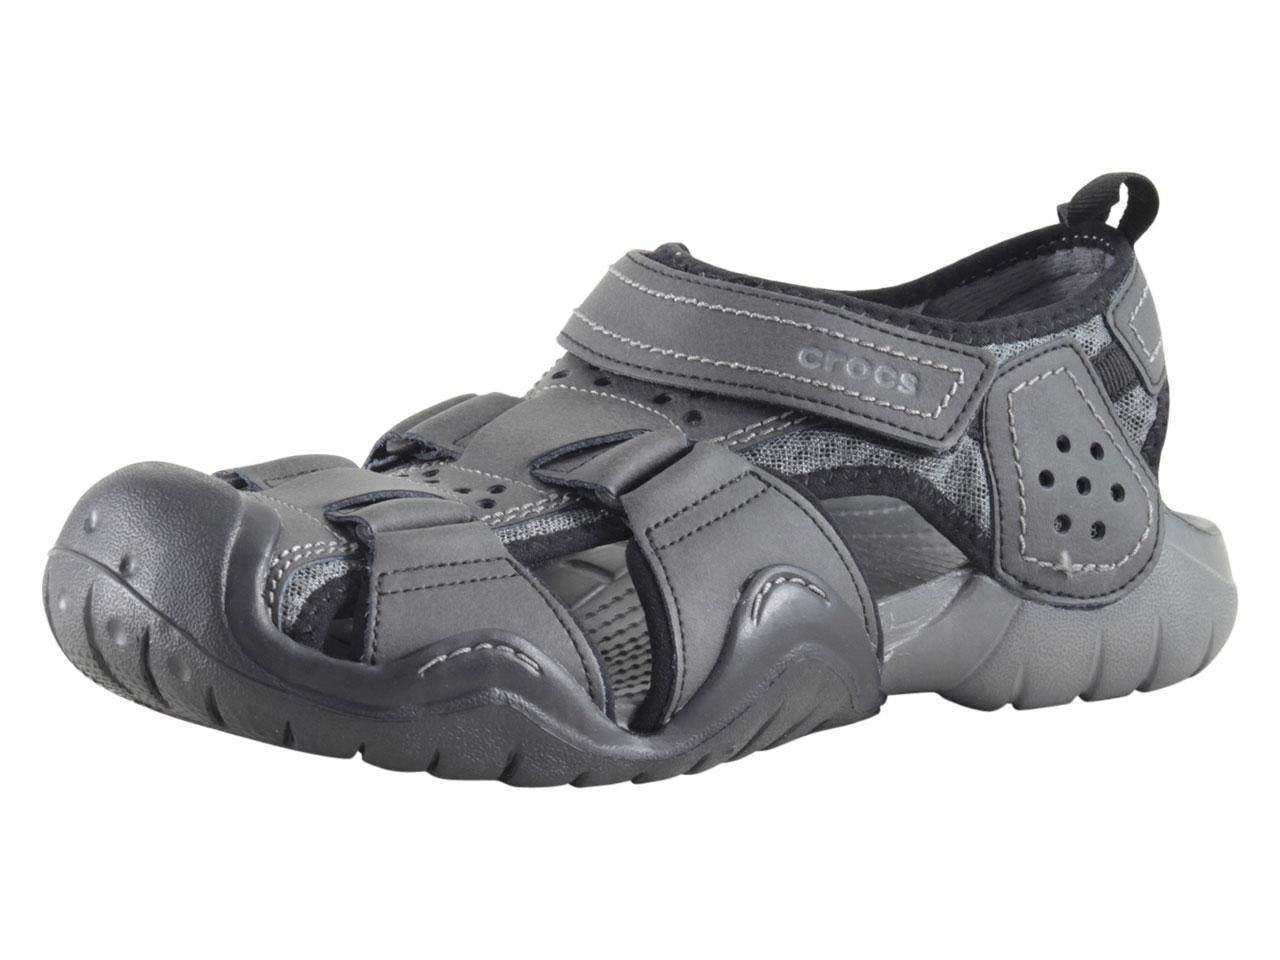 89ce648f6005 Crocs Men s Swiftwater Leather Black Graphite Fisherman Sandals ...